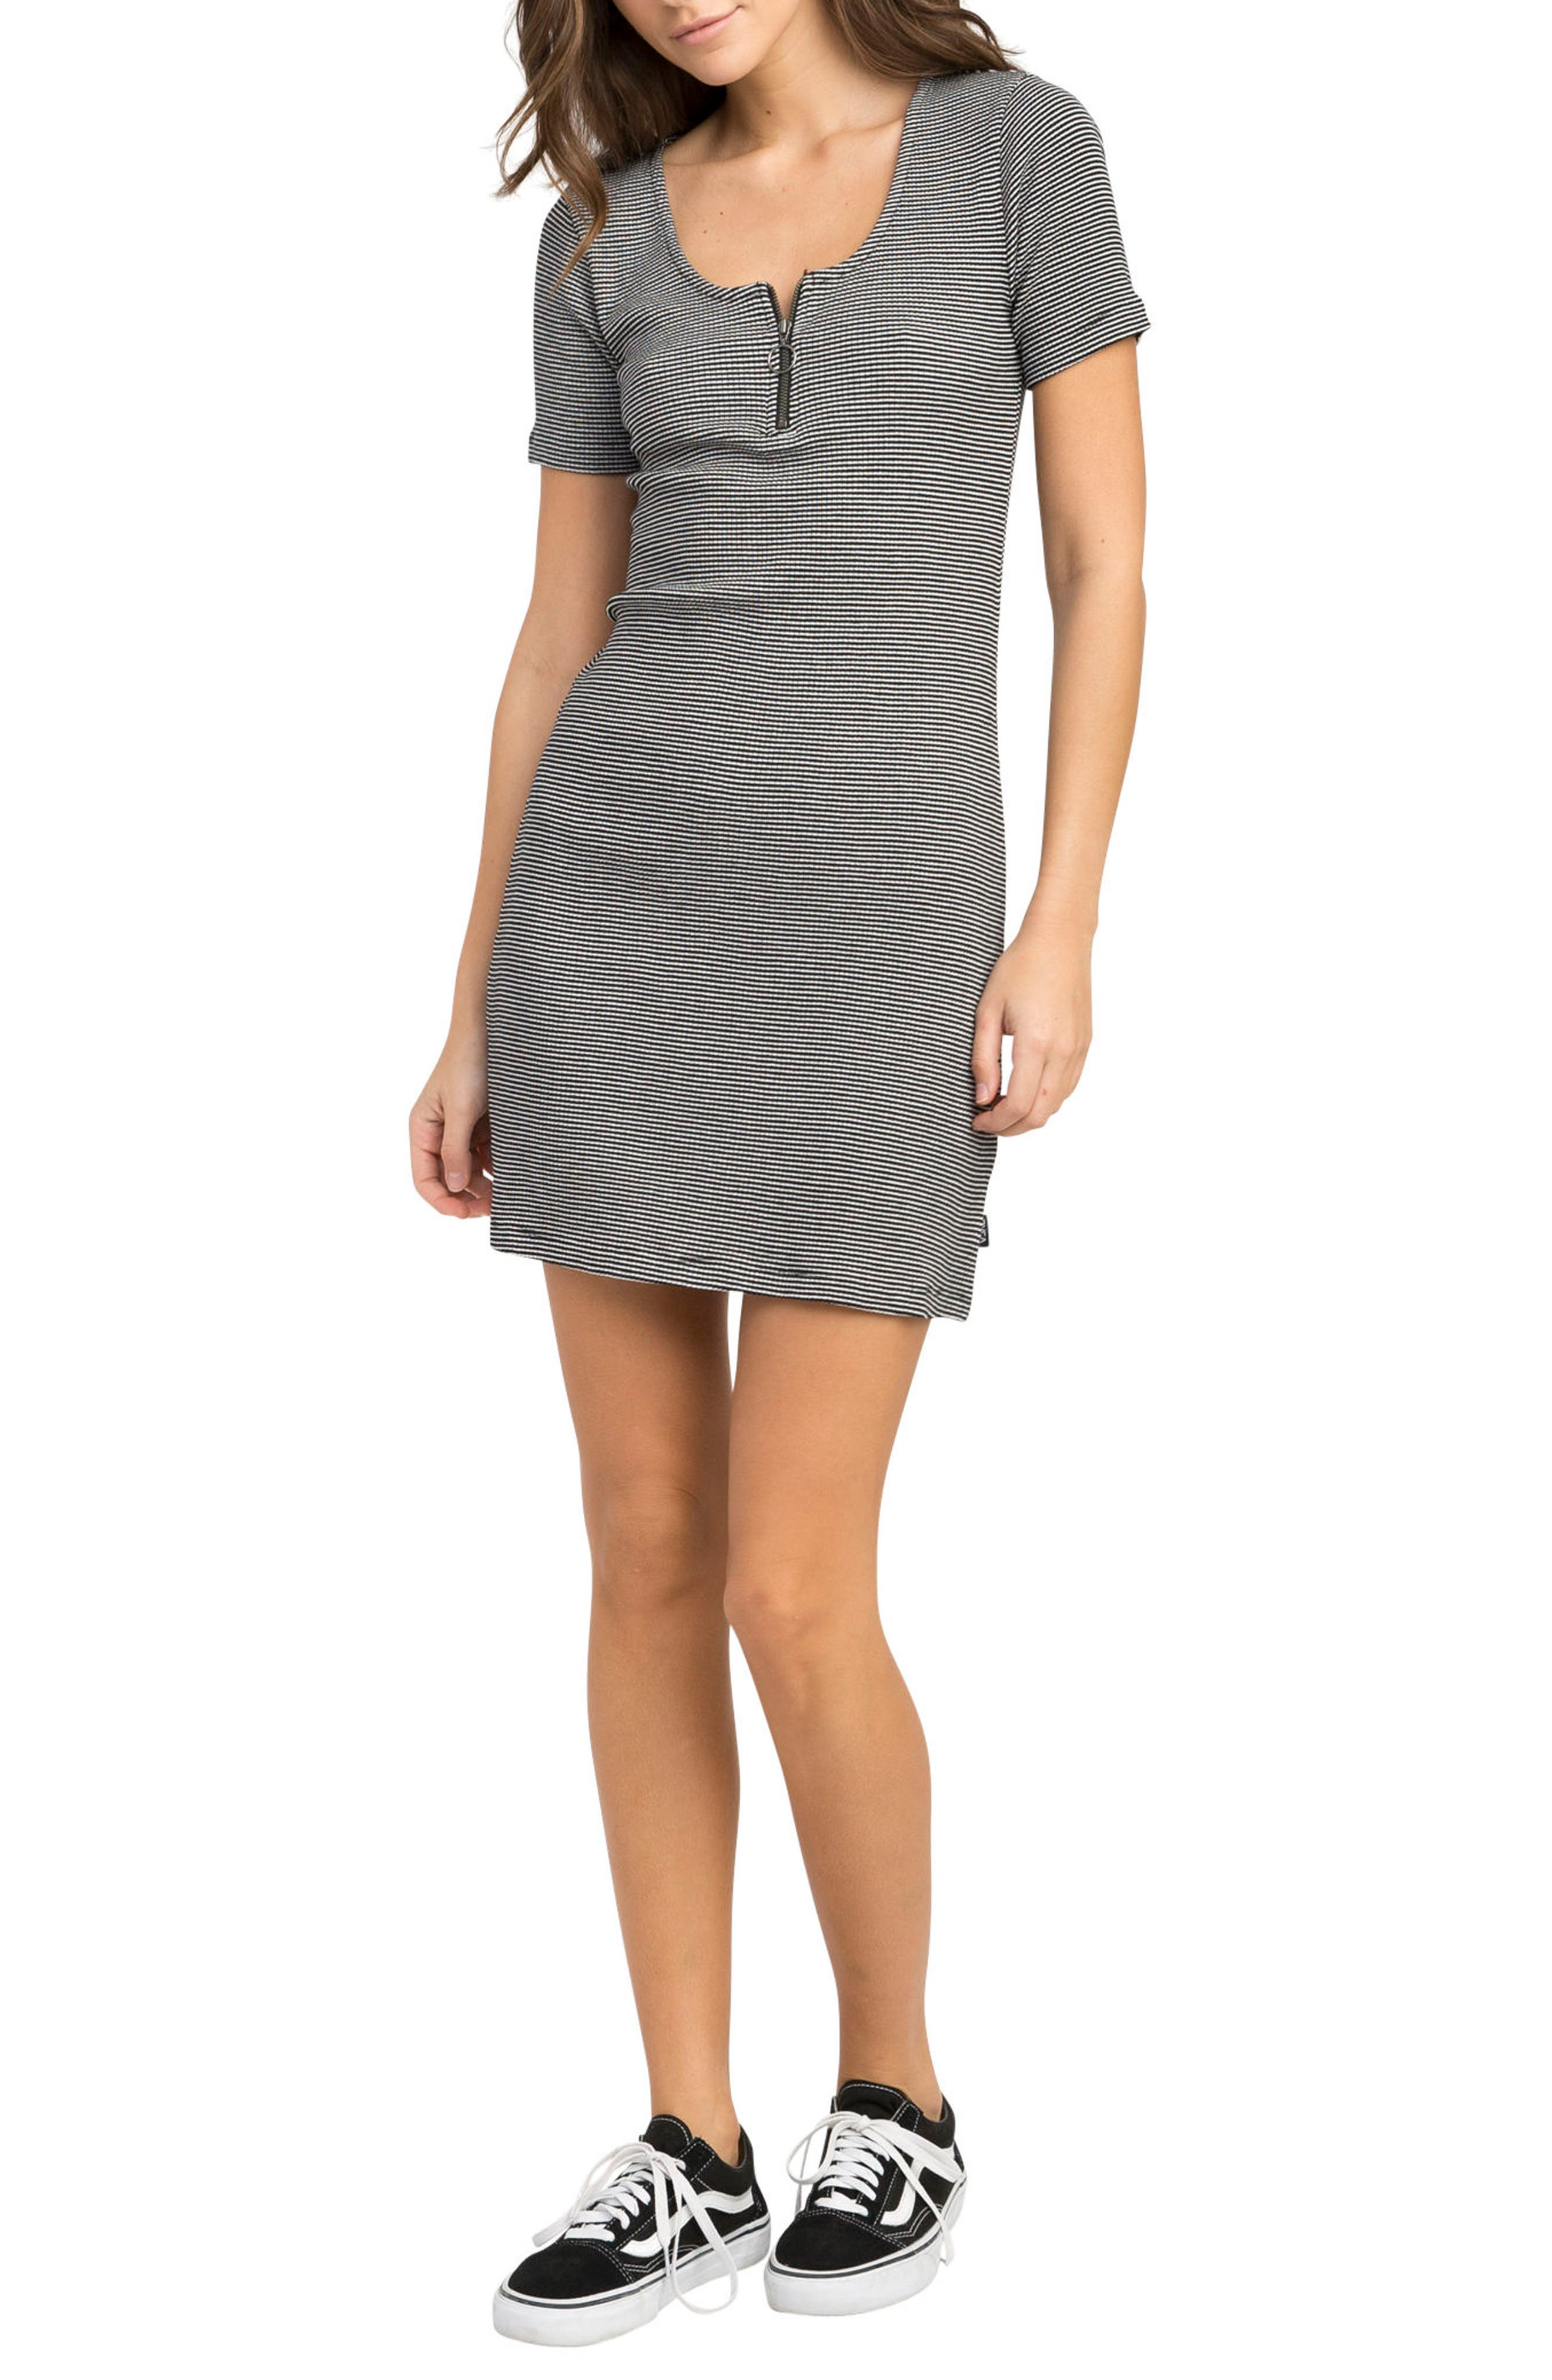 Zip It Striped Dress,                             Main thumbnail 1, color,                             001